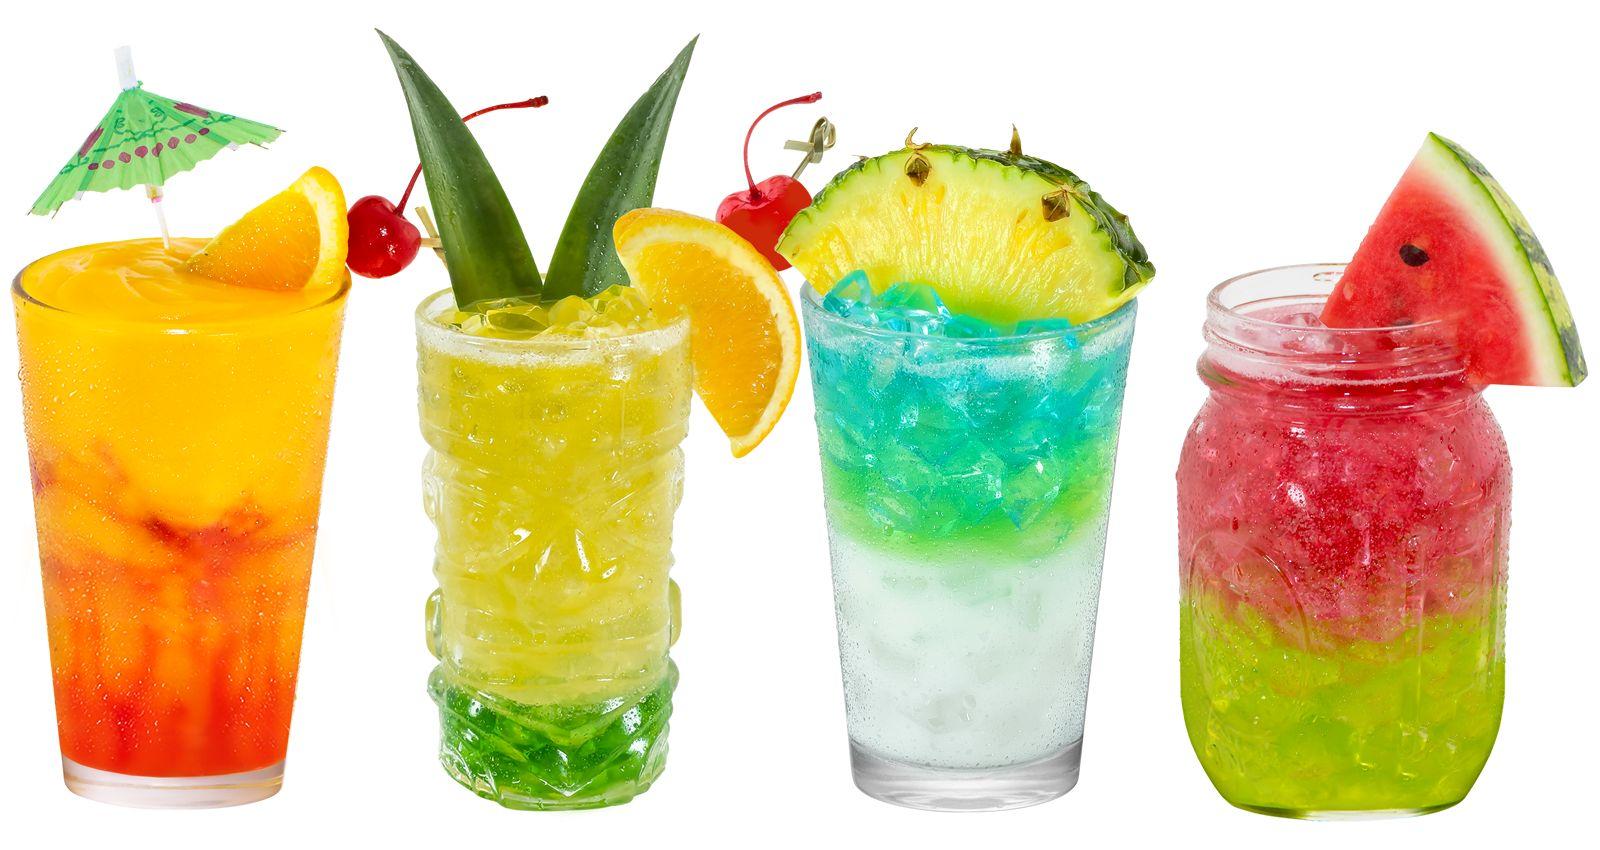 Celebrate Fun Under the Sun with Bennigan's New Summer Shenanigan's Menu